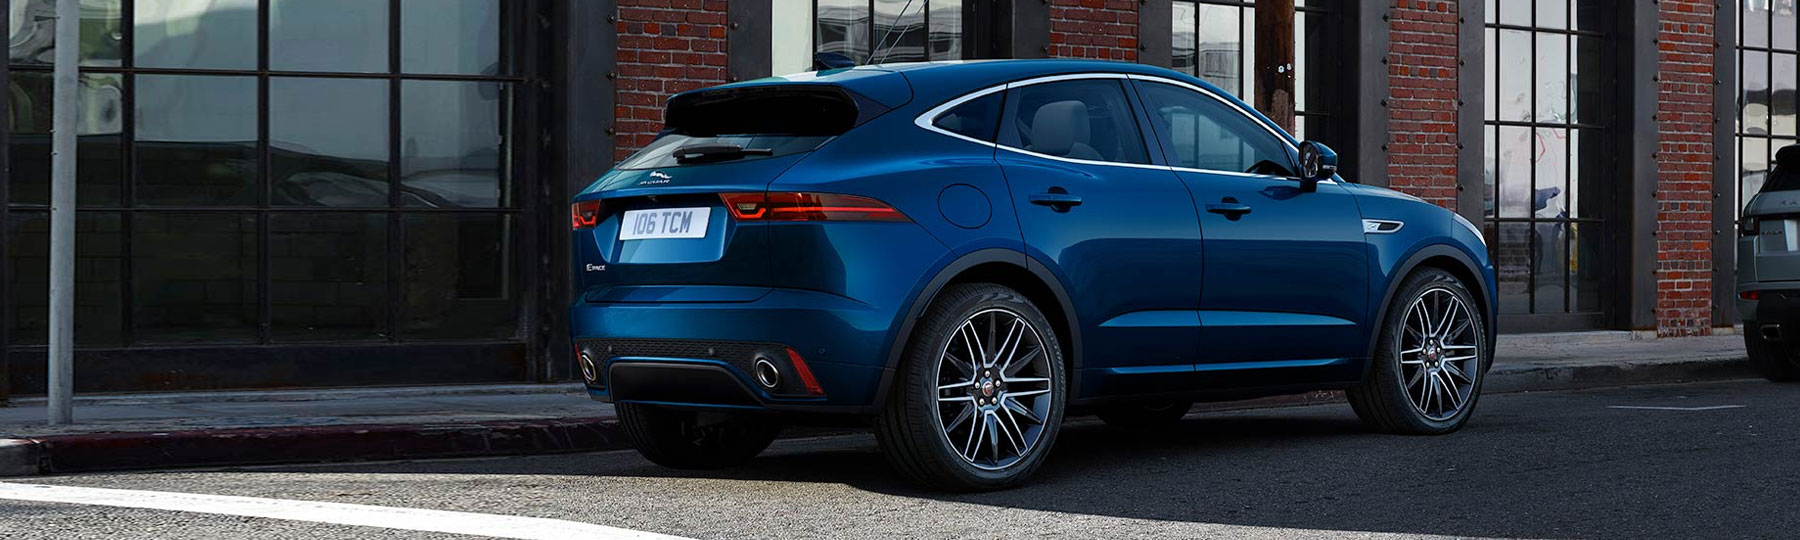 jaguar E-PACE Personal Contract Hire Offer